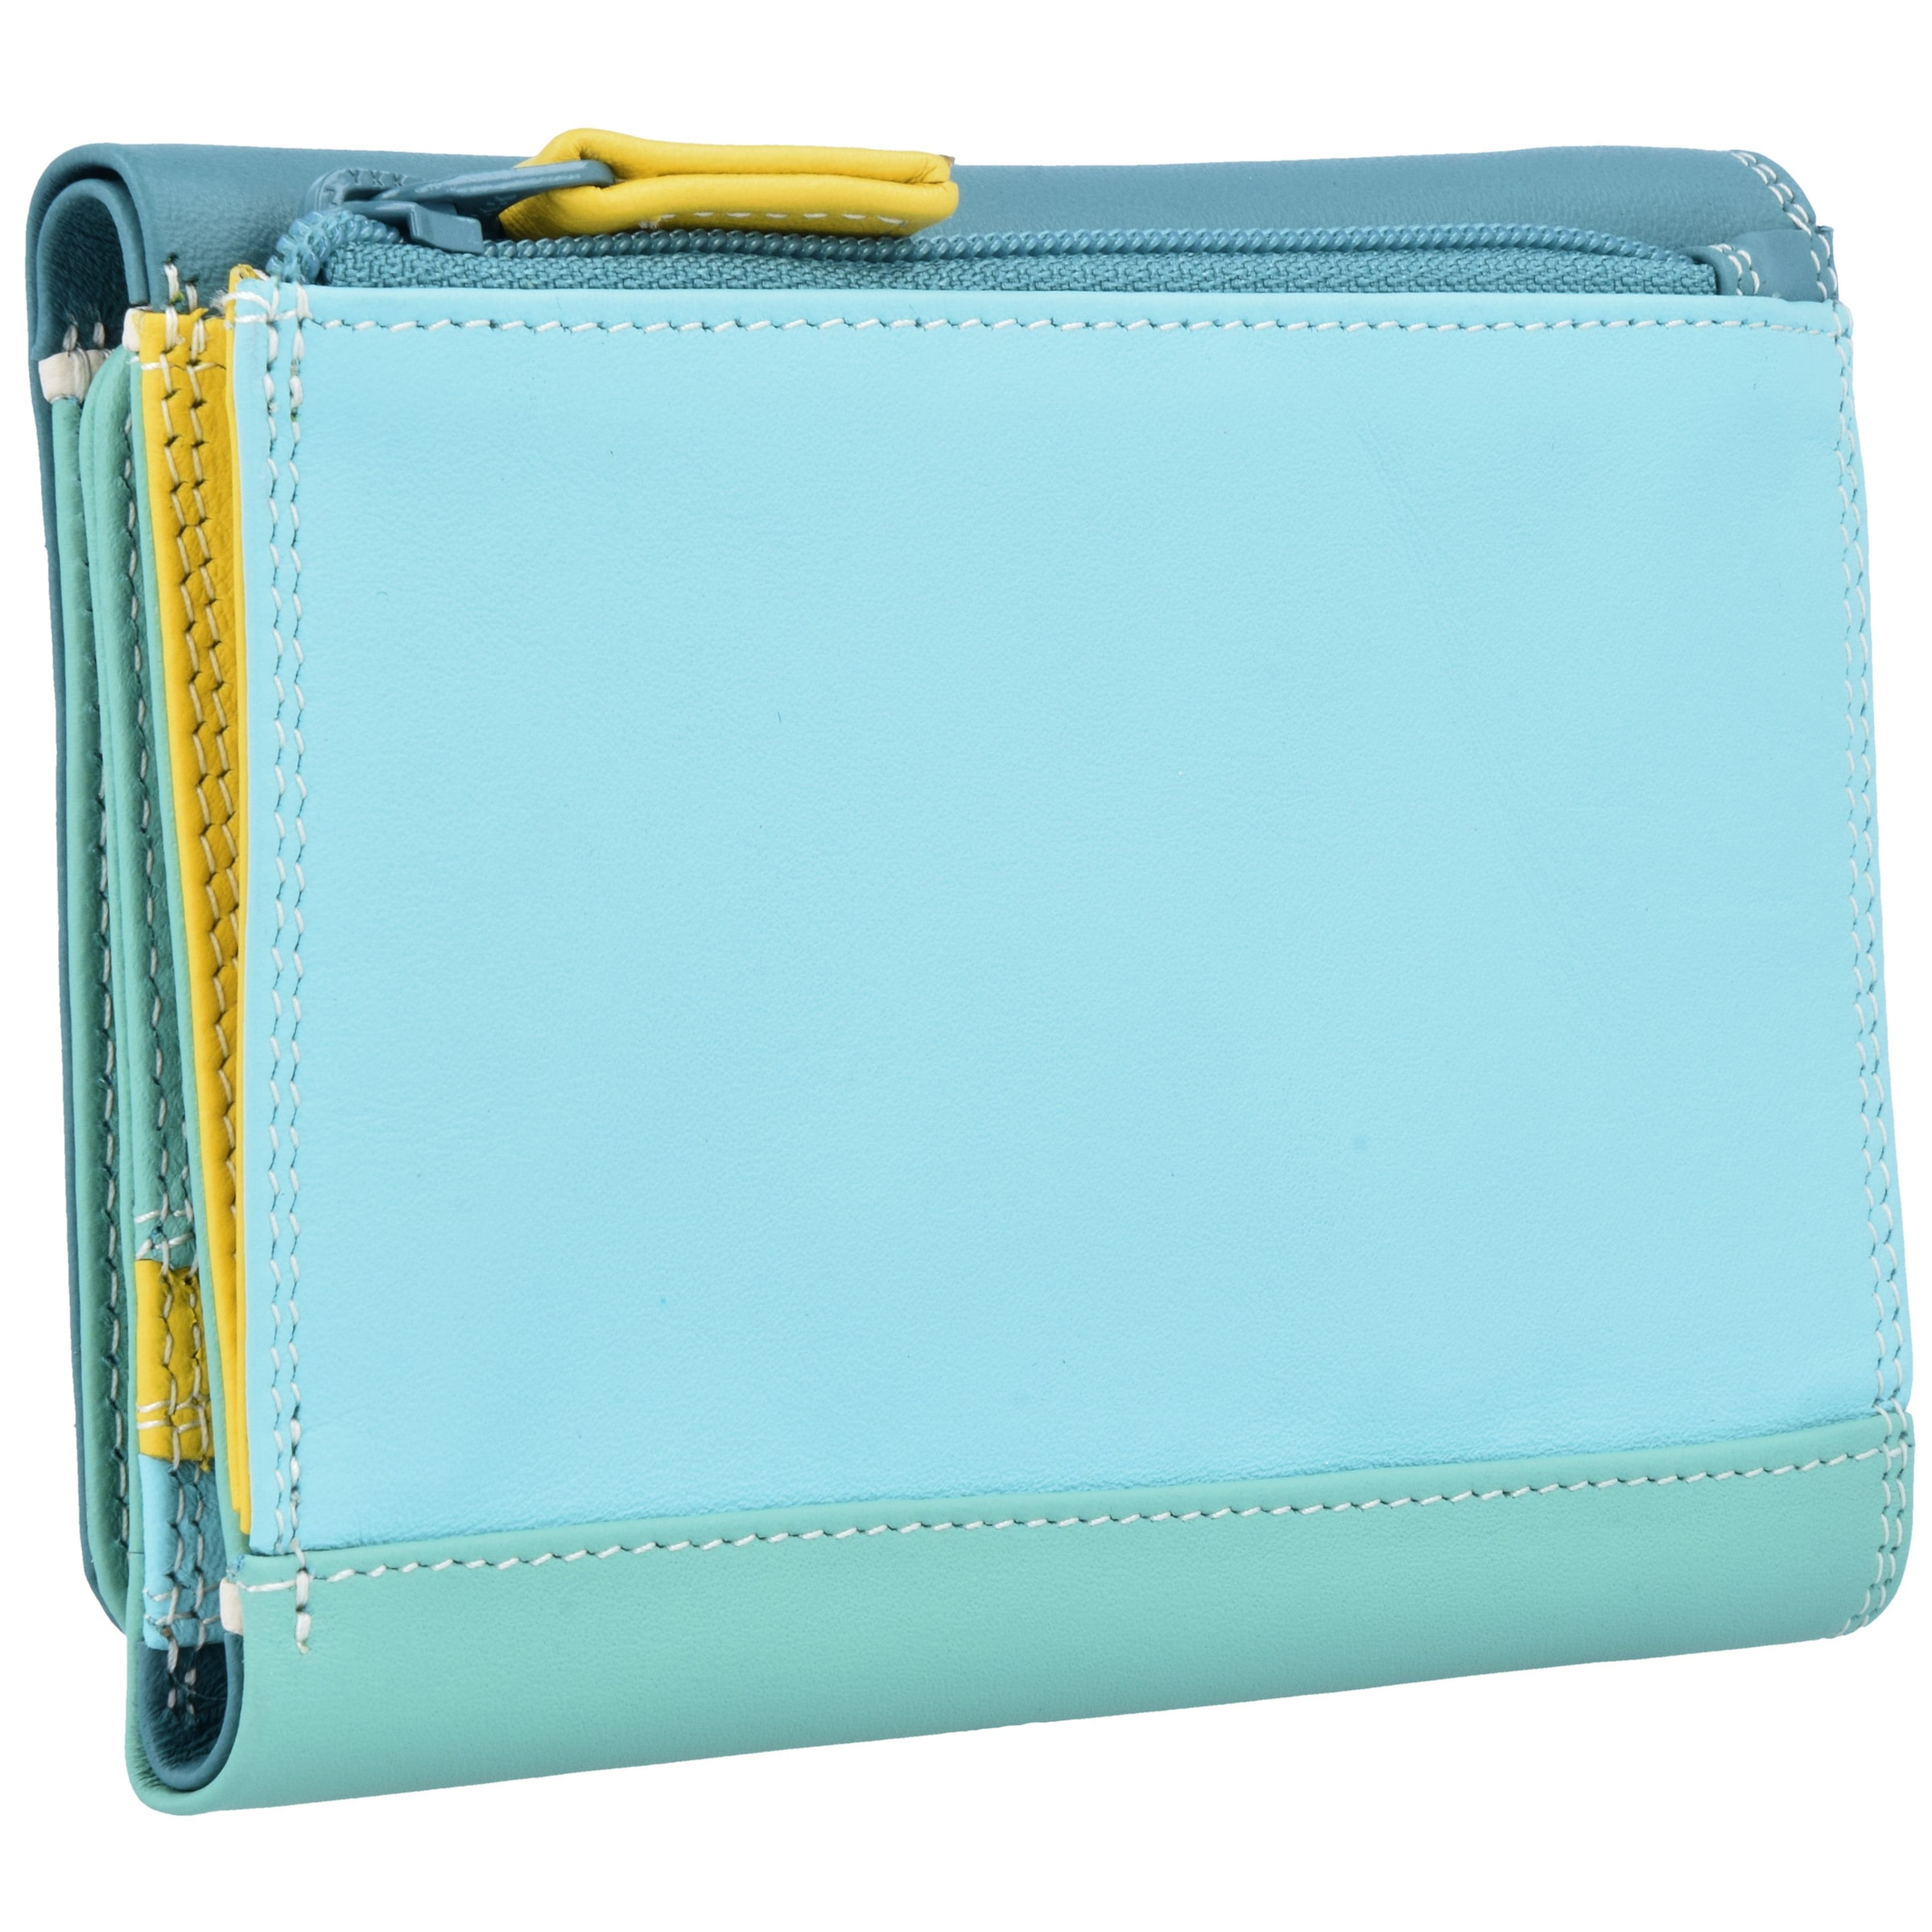 fold' Pastel Menthe En monnaies Tri TurquoiseBleu 'medium Mywalit Porte Jaune K1JcFl